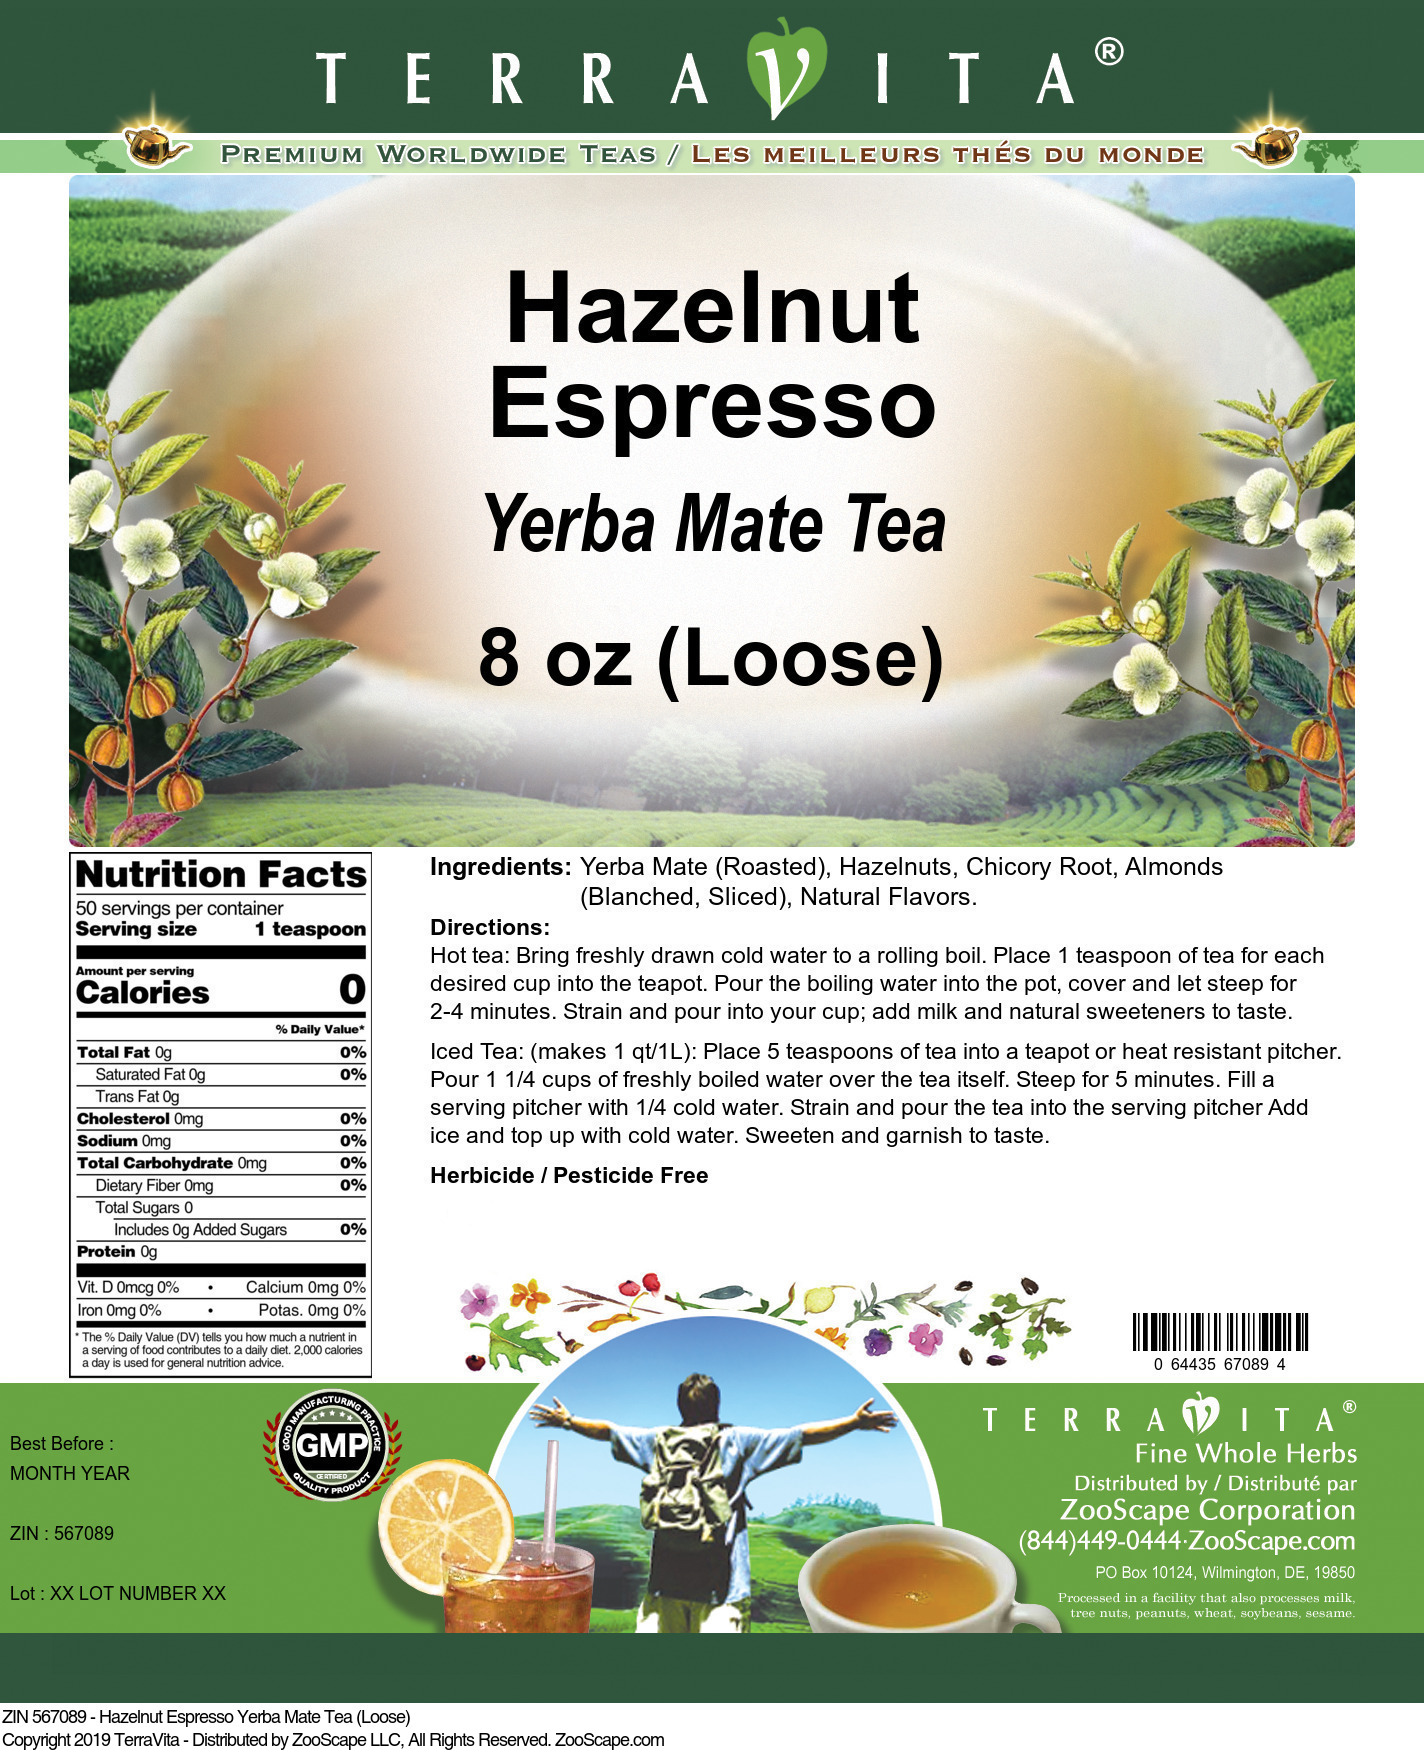 Hazelnut Espresso Yerba Mate Tea (Loose)